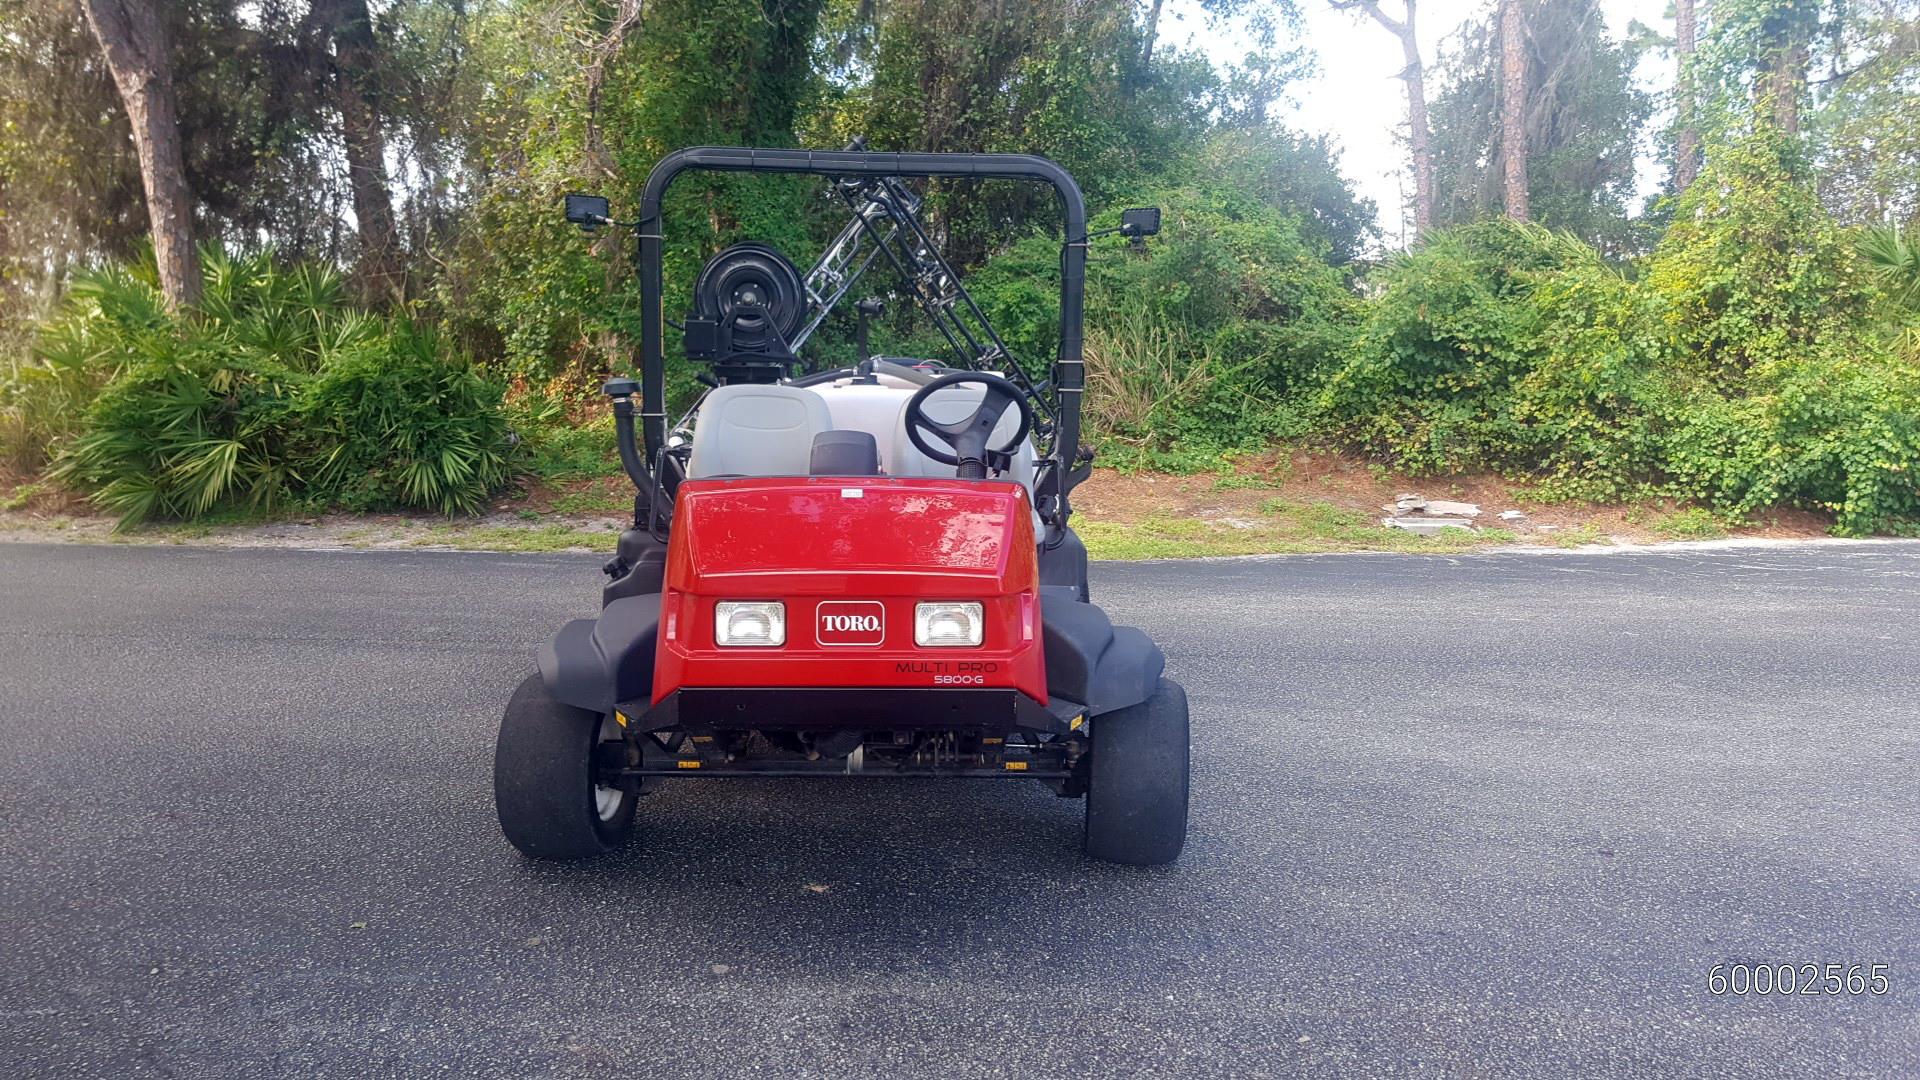 Toro Multi Pro 5800-G Excelarate